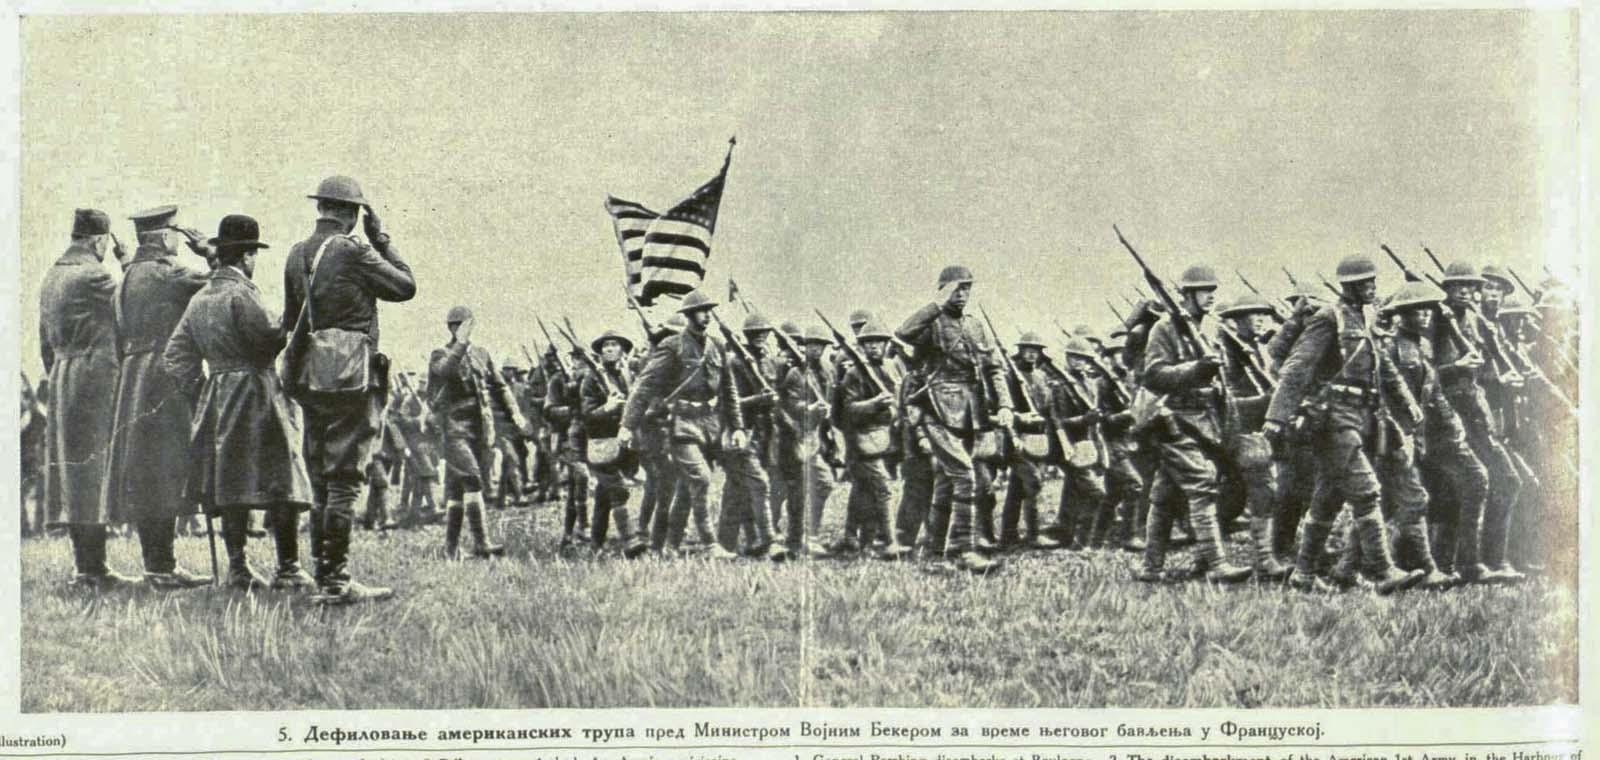 World War I Centennial 2018 Silver Dollar Photos